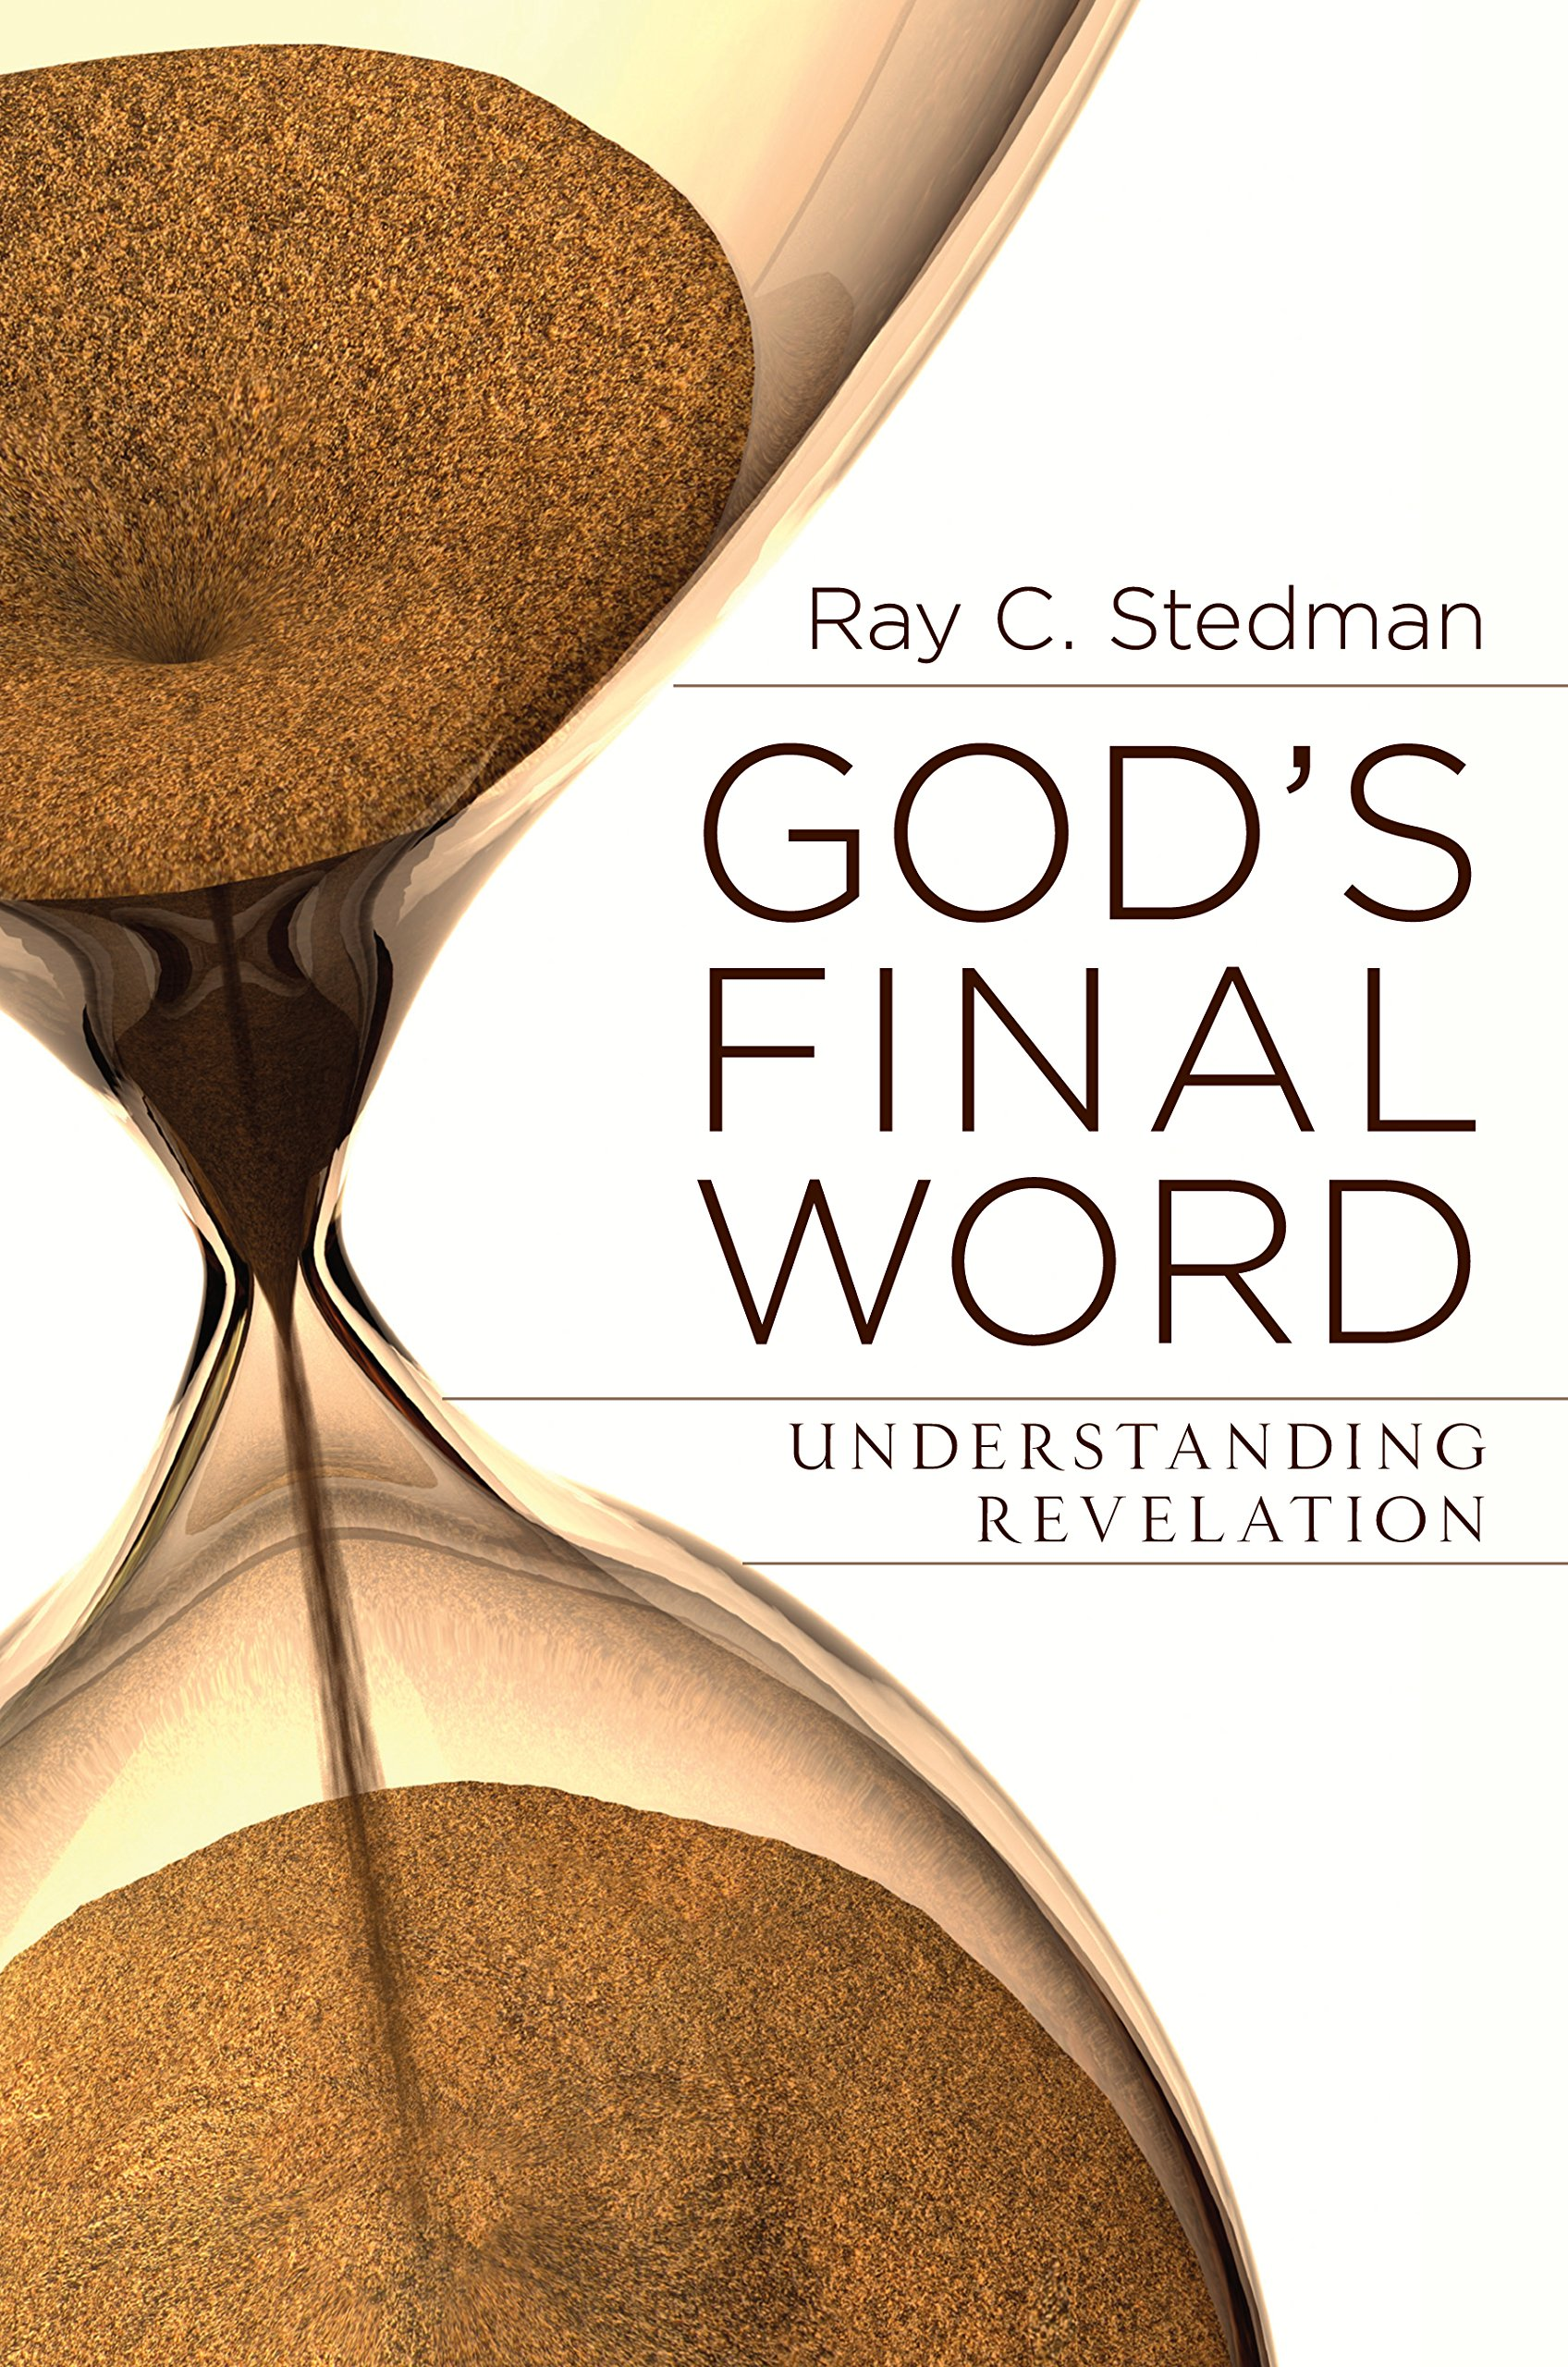 god-s-final-word-understanding-revelation